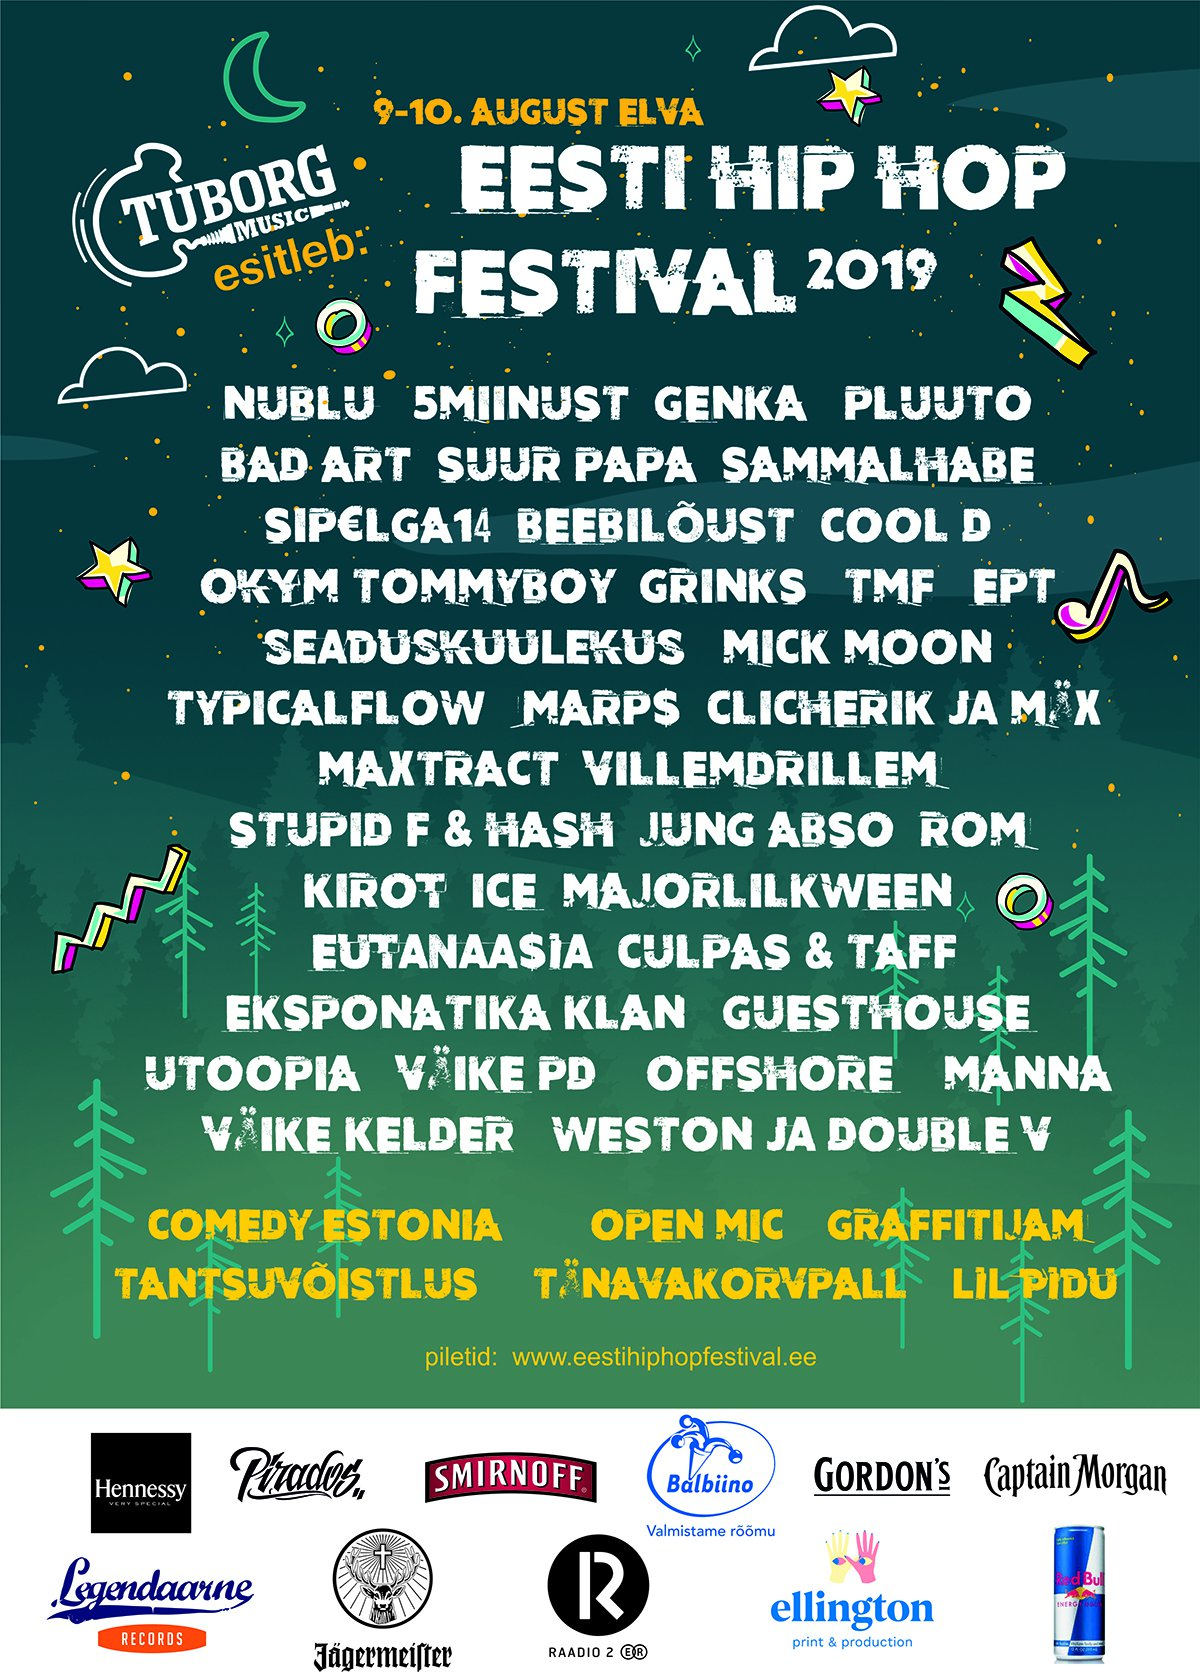 eesti hip hop festival.jpg